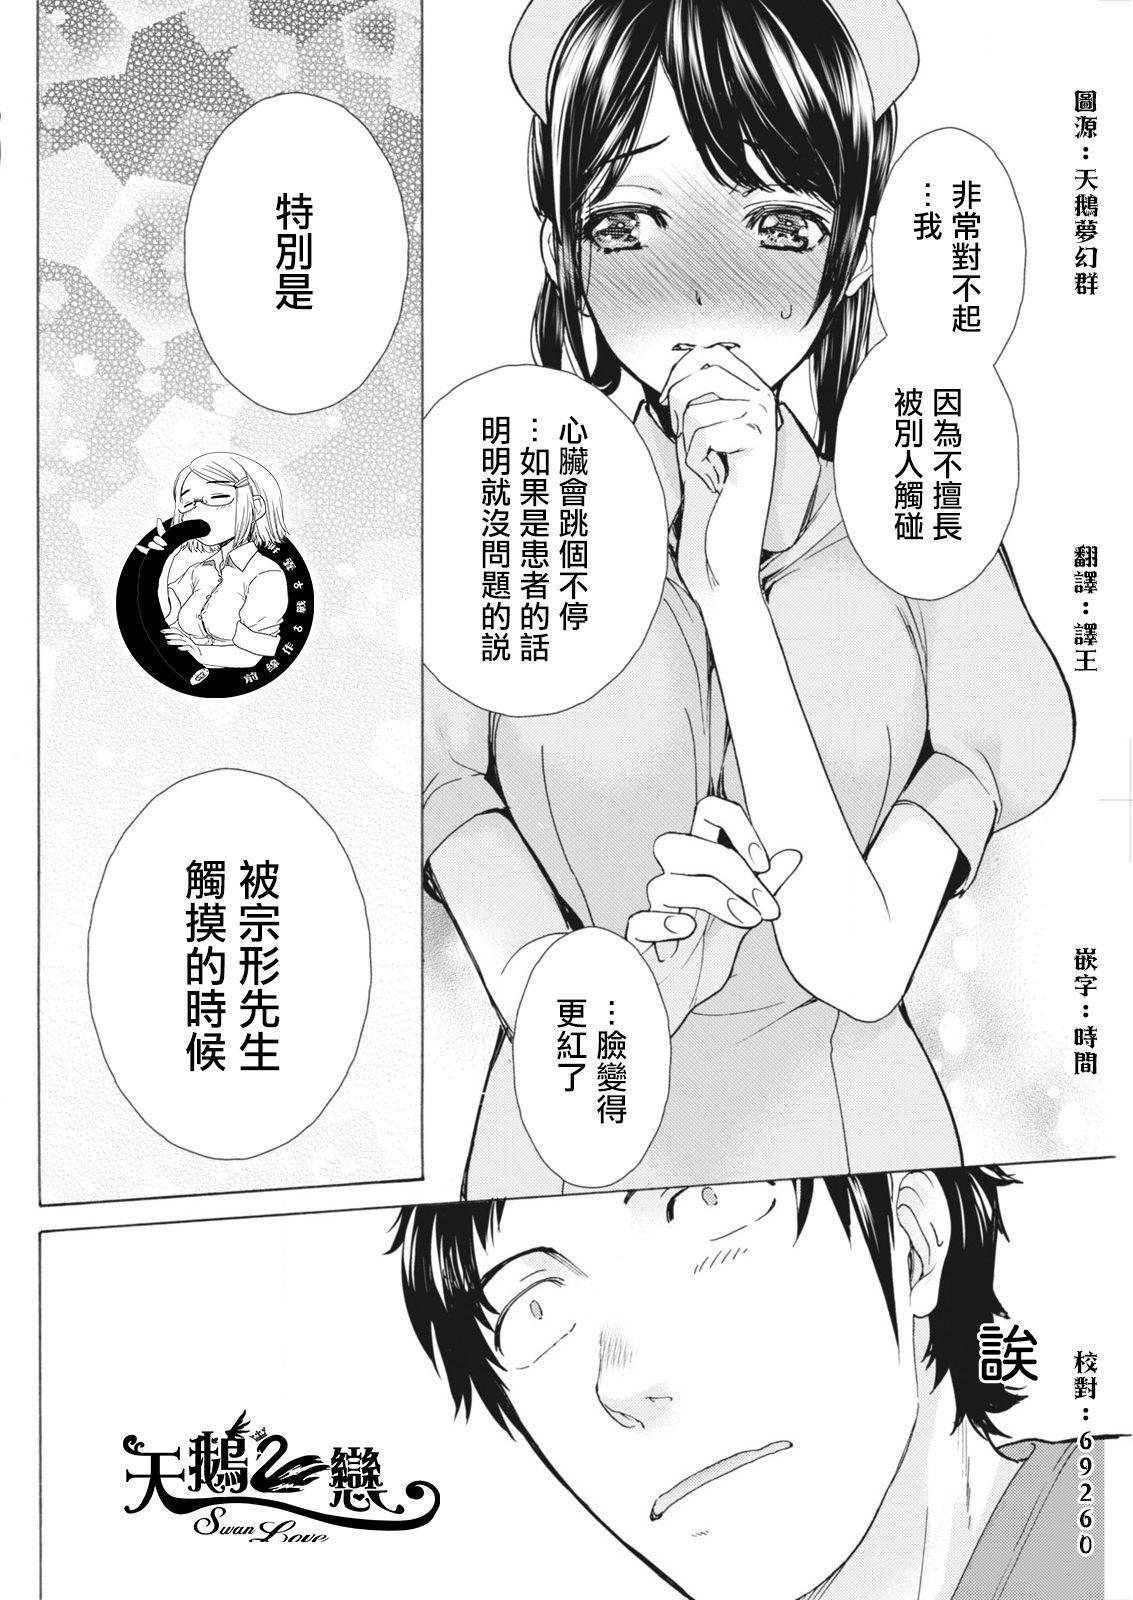 Opparadise wa Shinryouchu | 欧派天国诊疗中 Ch. 9 9